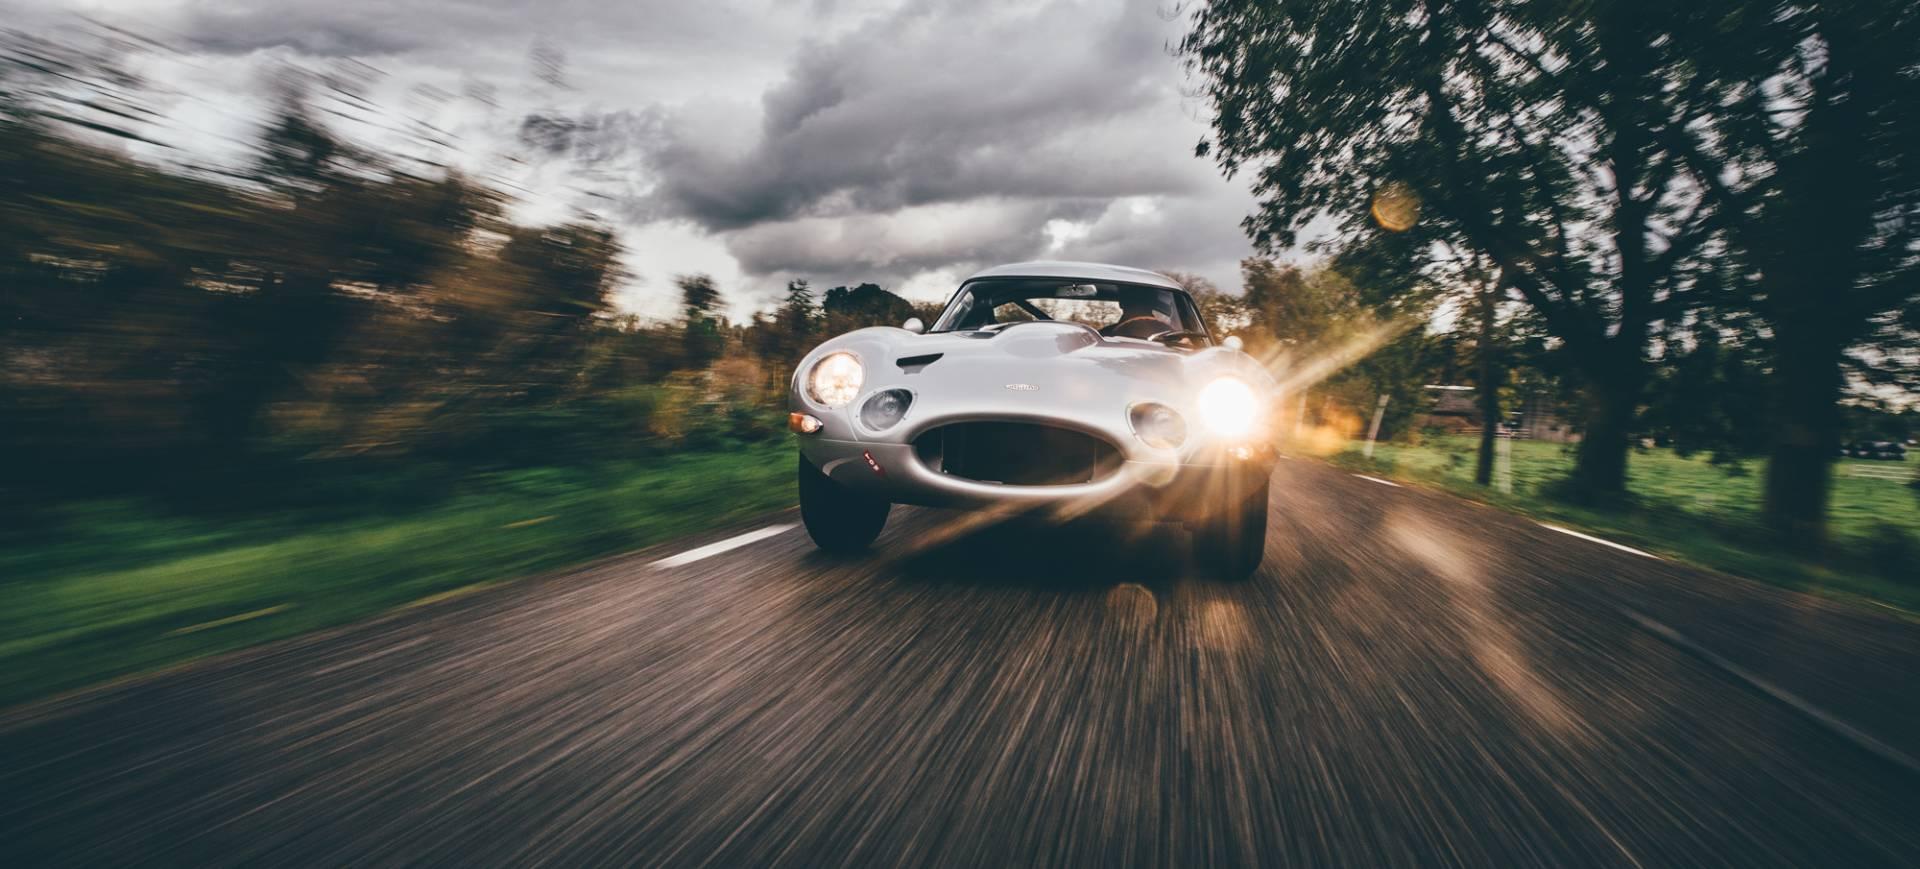 1963 Jaguar E-Type 3.8 Lowdrag Recreation 4